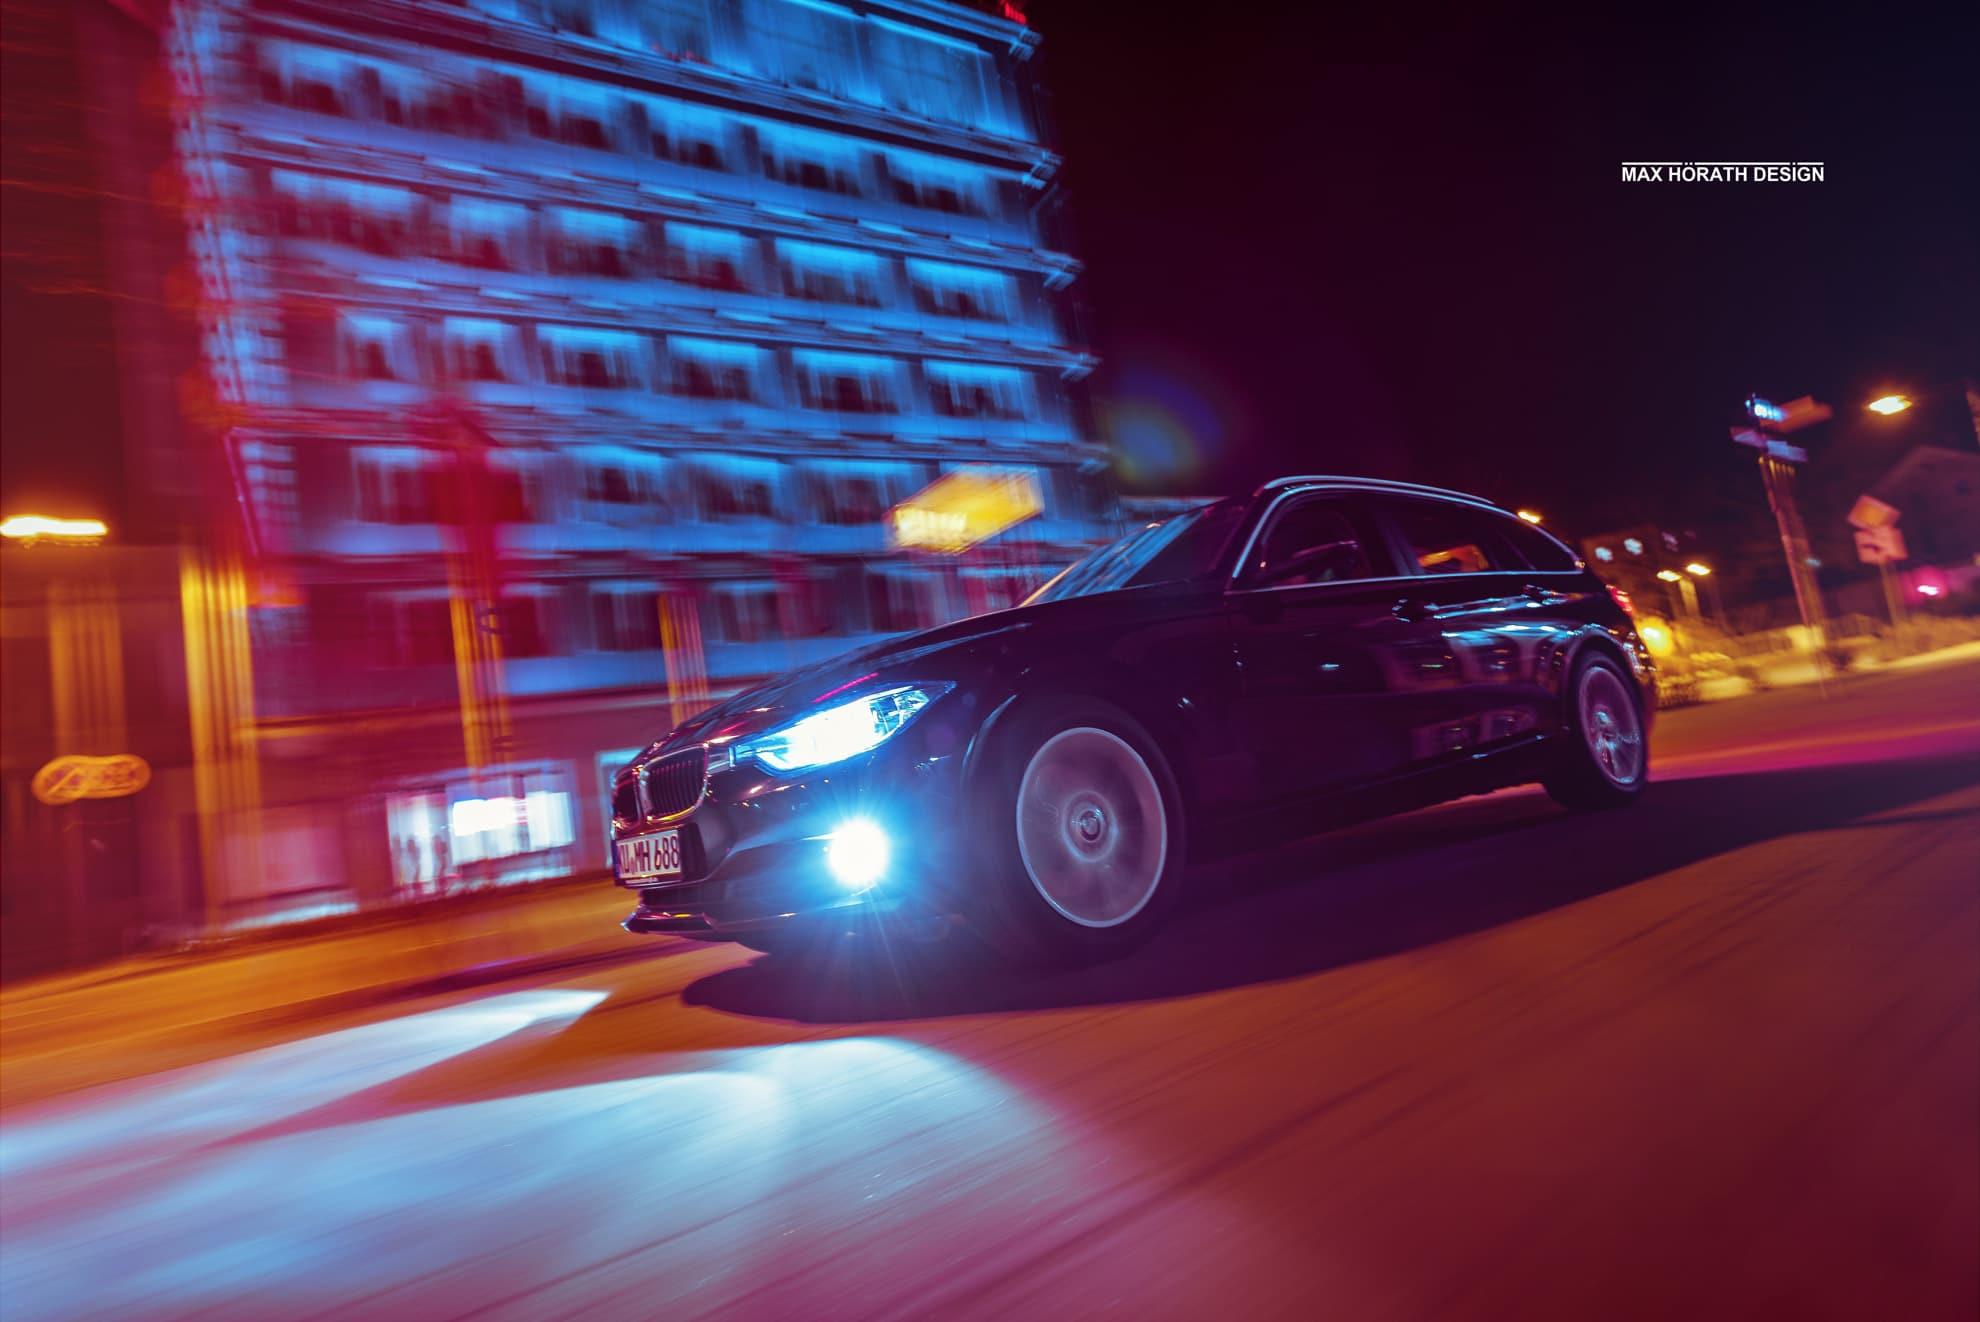 Car Photography – Car Rig